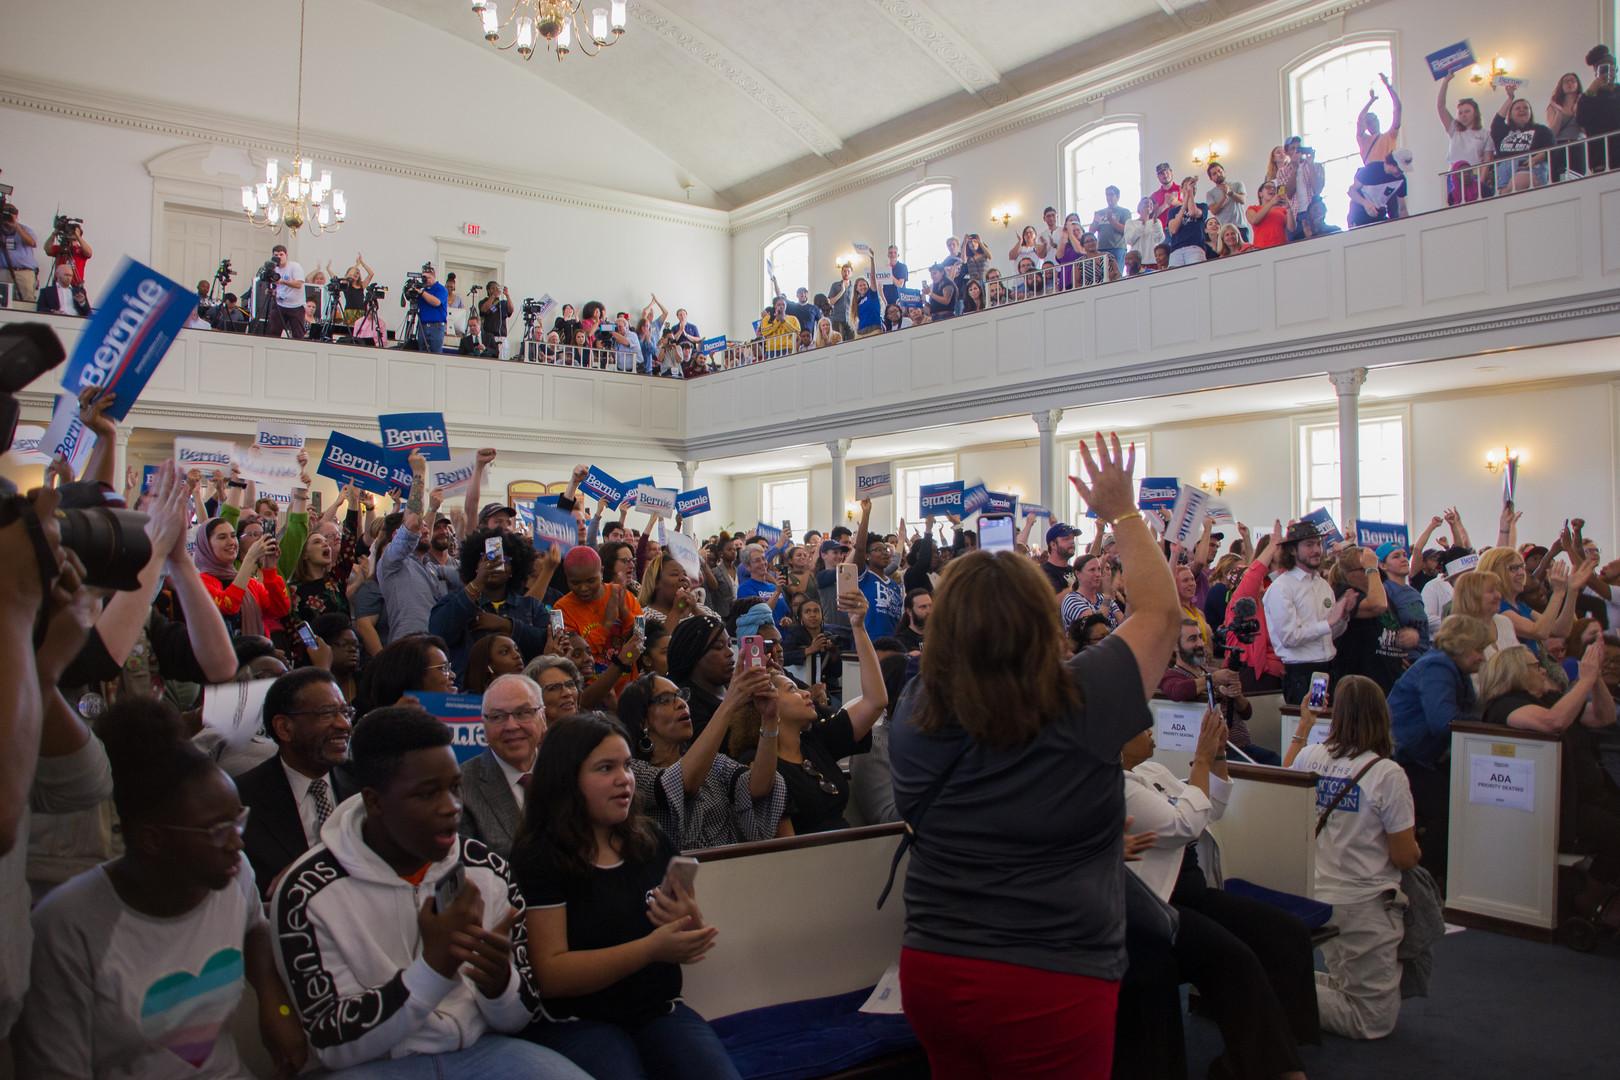 Bernie Sanders supporter cheer on from Bernie Sanders speech.